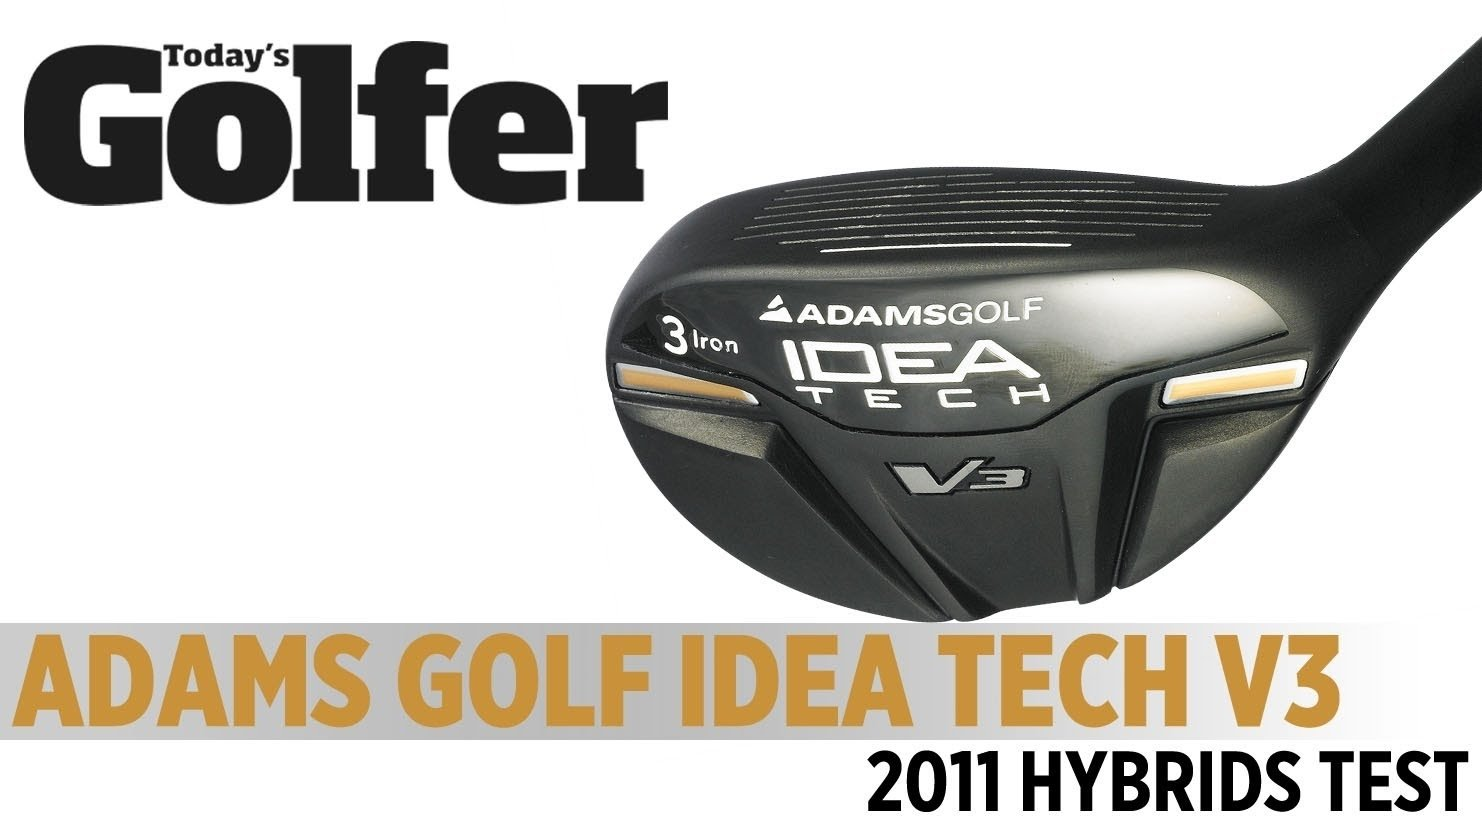 10 Perfect Adams Idea Tech V3 Hybrid adams golf idea tech v3 hybrid 2011 hybrids test todays golfer